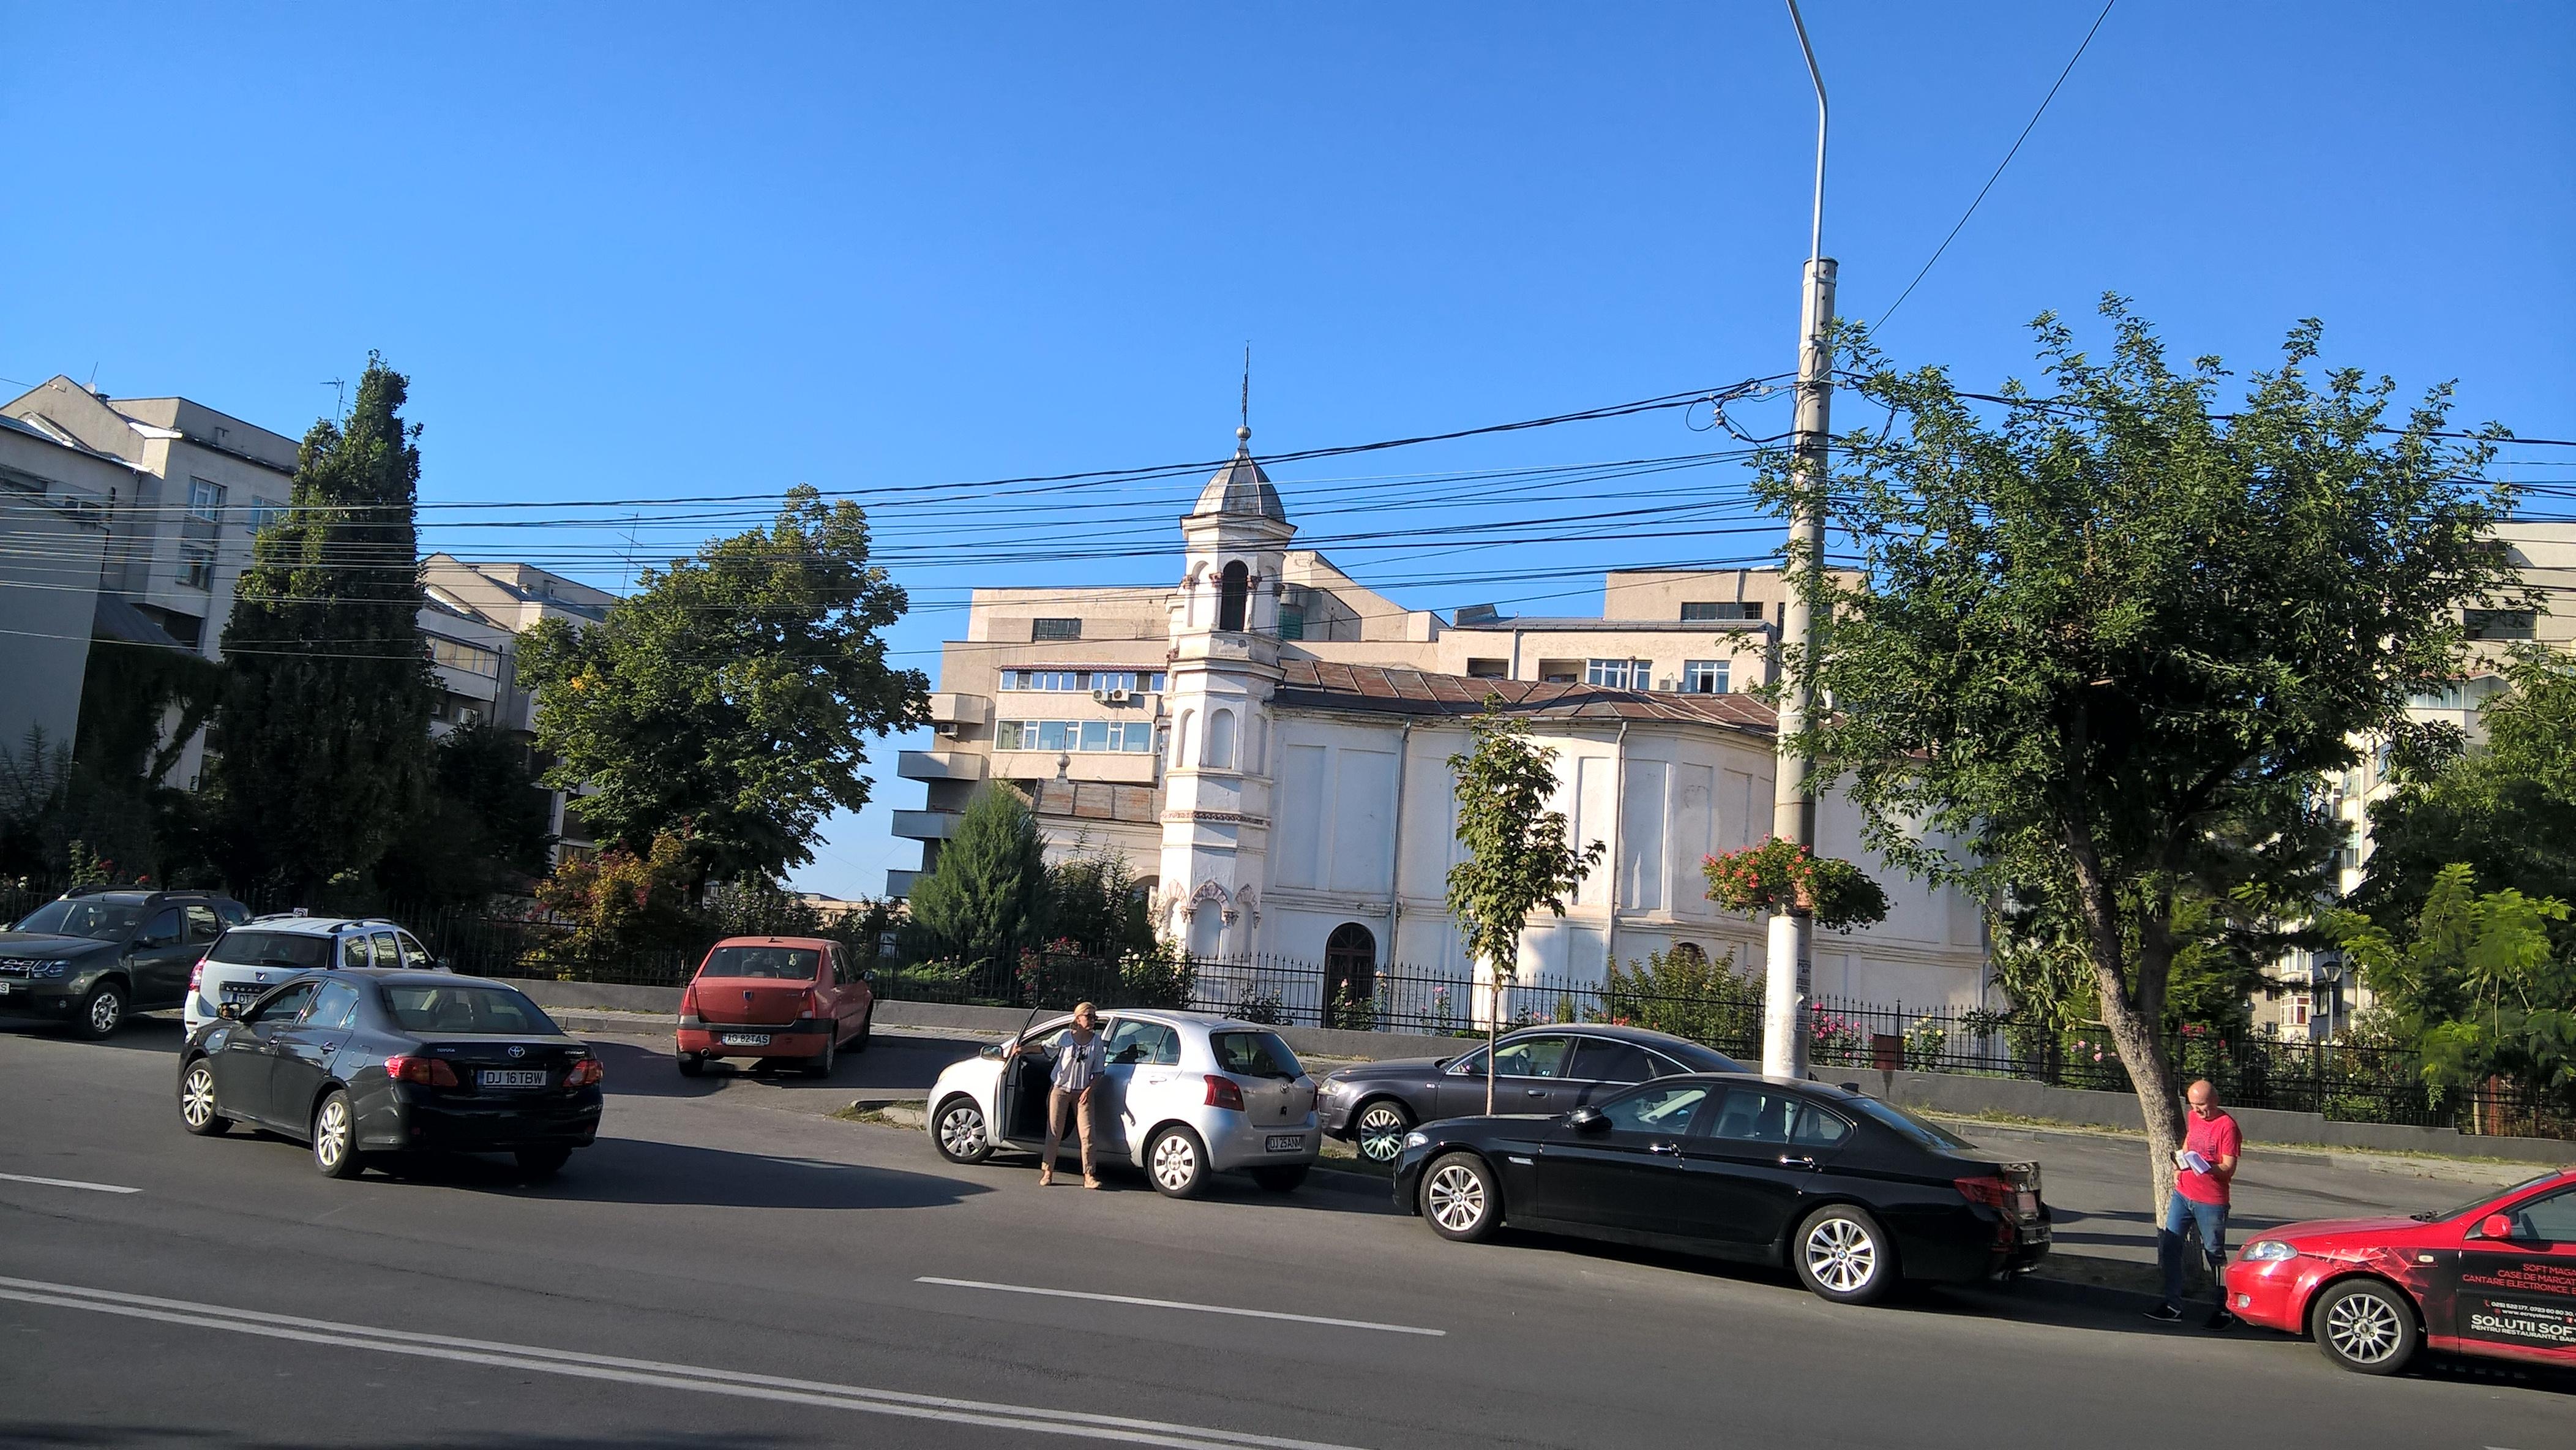 File:Ansamblul Bisericii Toti Sf-Hagi Enus DJ-II-a-B-07981 (1) jpg